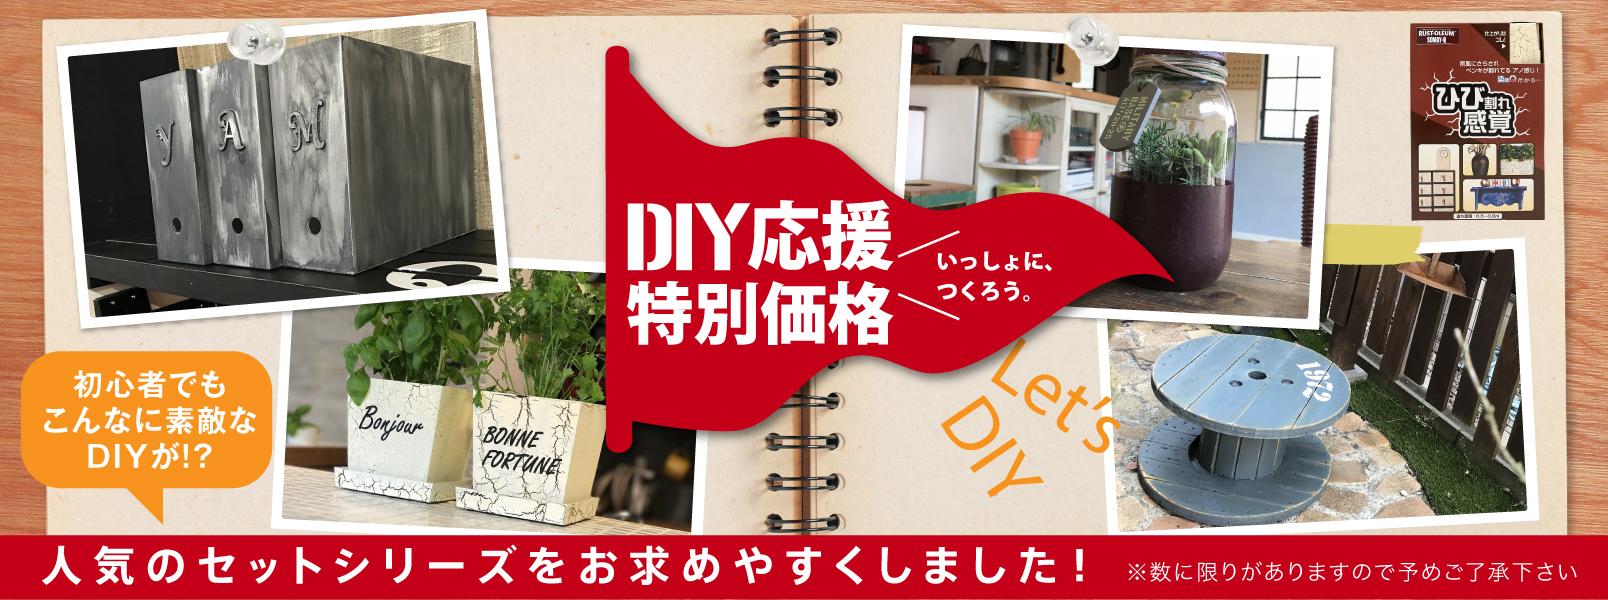 DIY応援特別価格